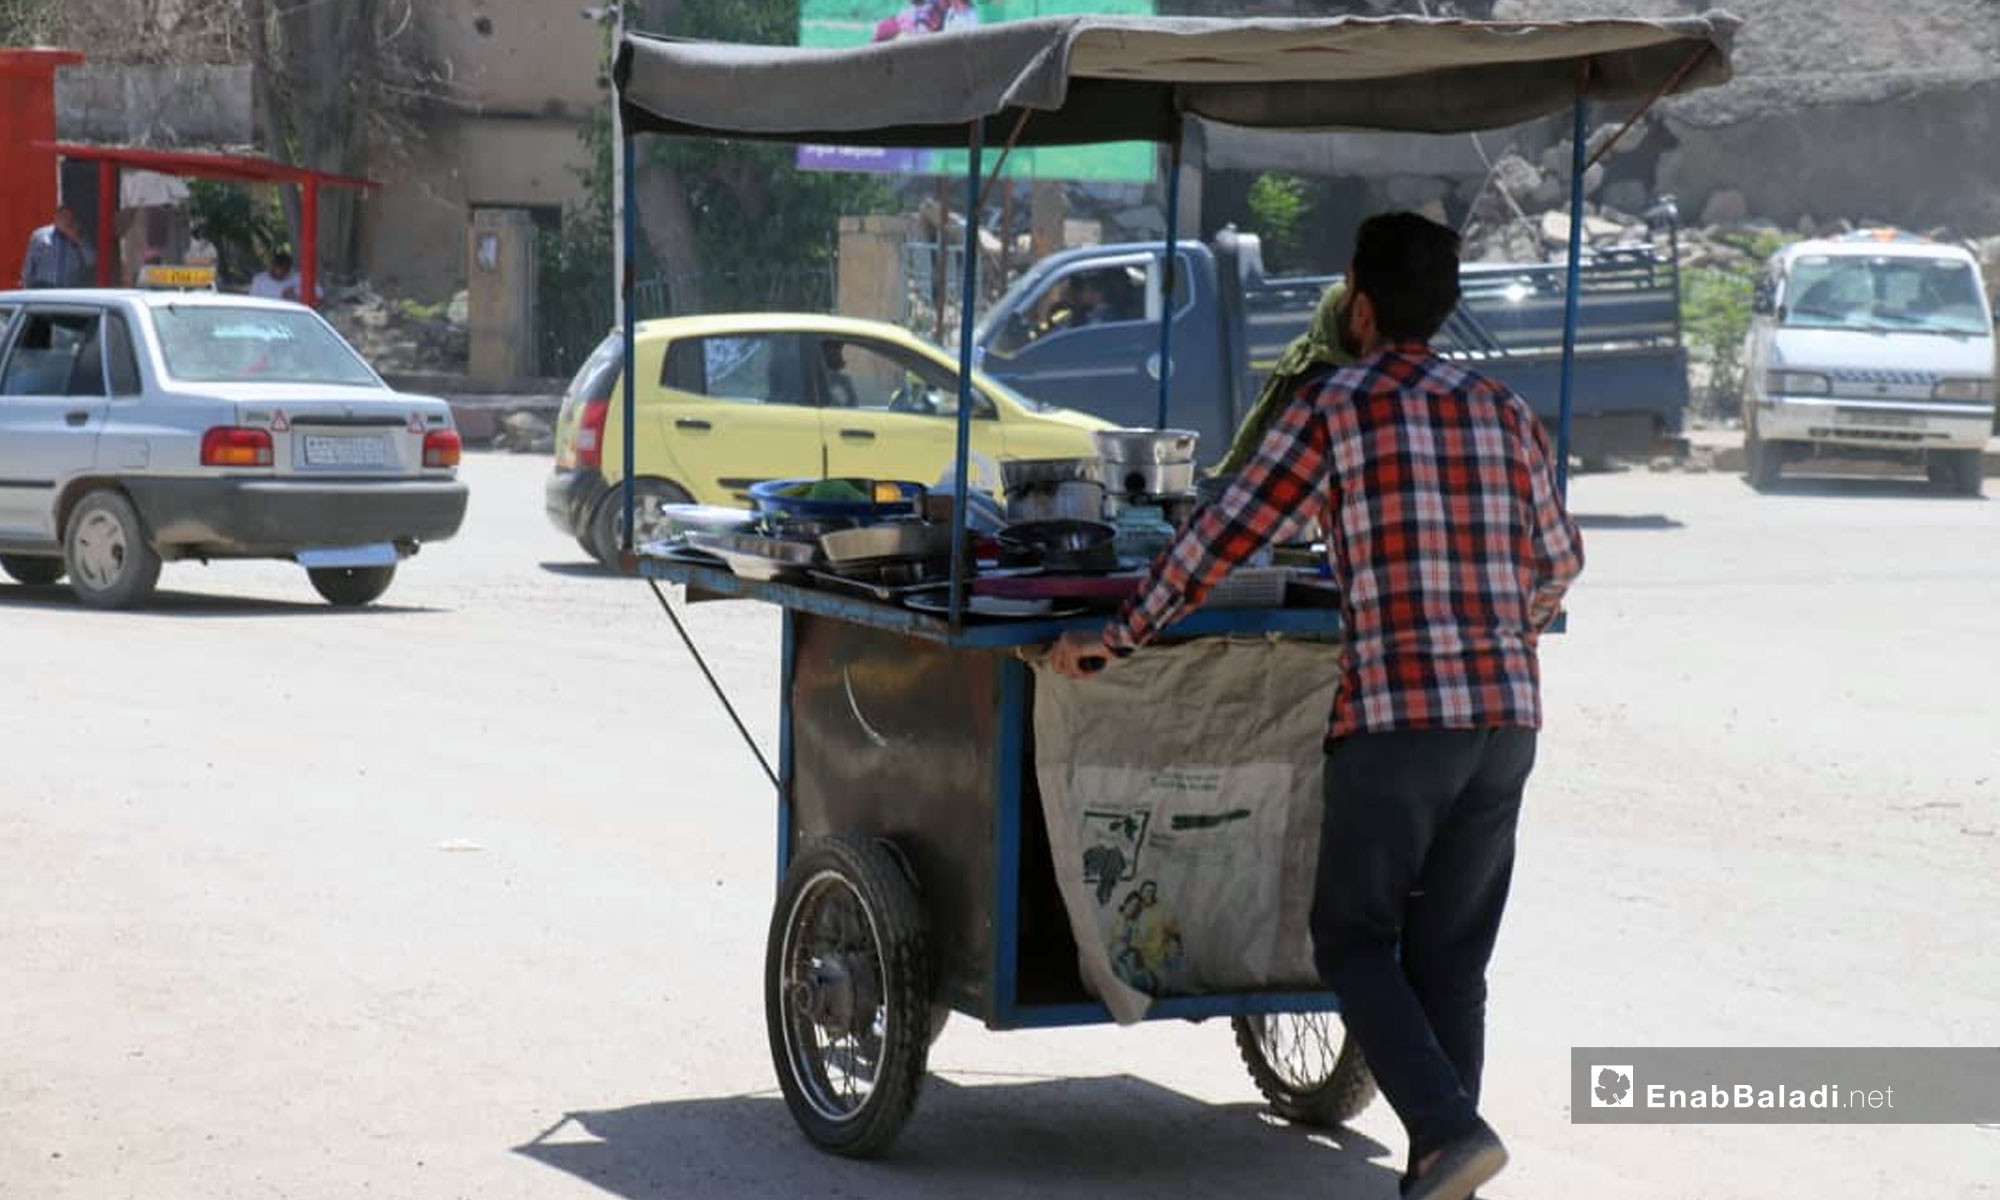 Raqqa city's markets on the first days of Ramadan – May 8, 2019 (Enab Baladi)